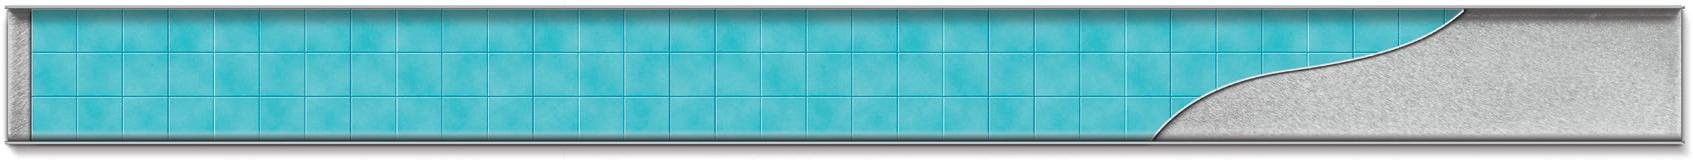 Водоотводящие желоба - floor-reshetka-glyanets - miroslav-chudej-s-r-o - 350-x-415 - 1-1 - 1 - 200 - czech-republic